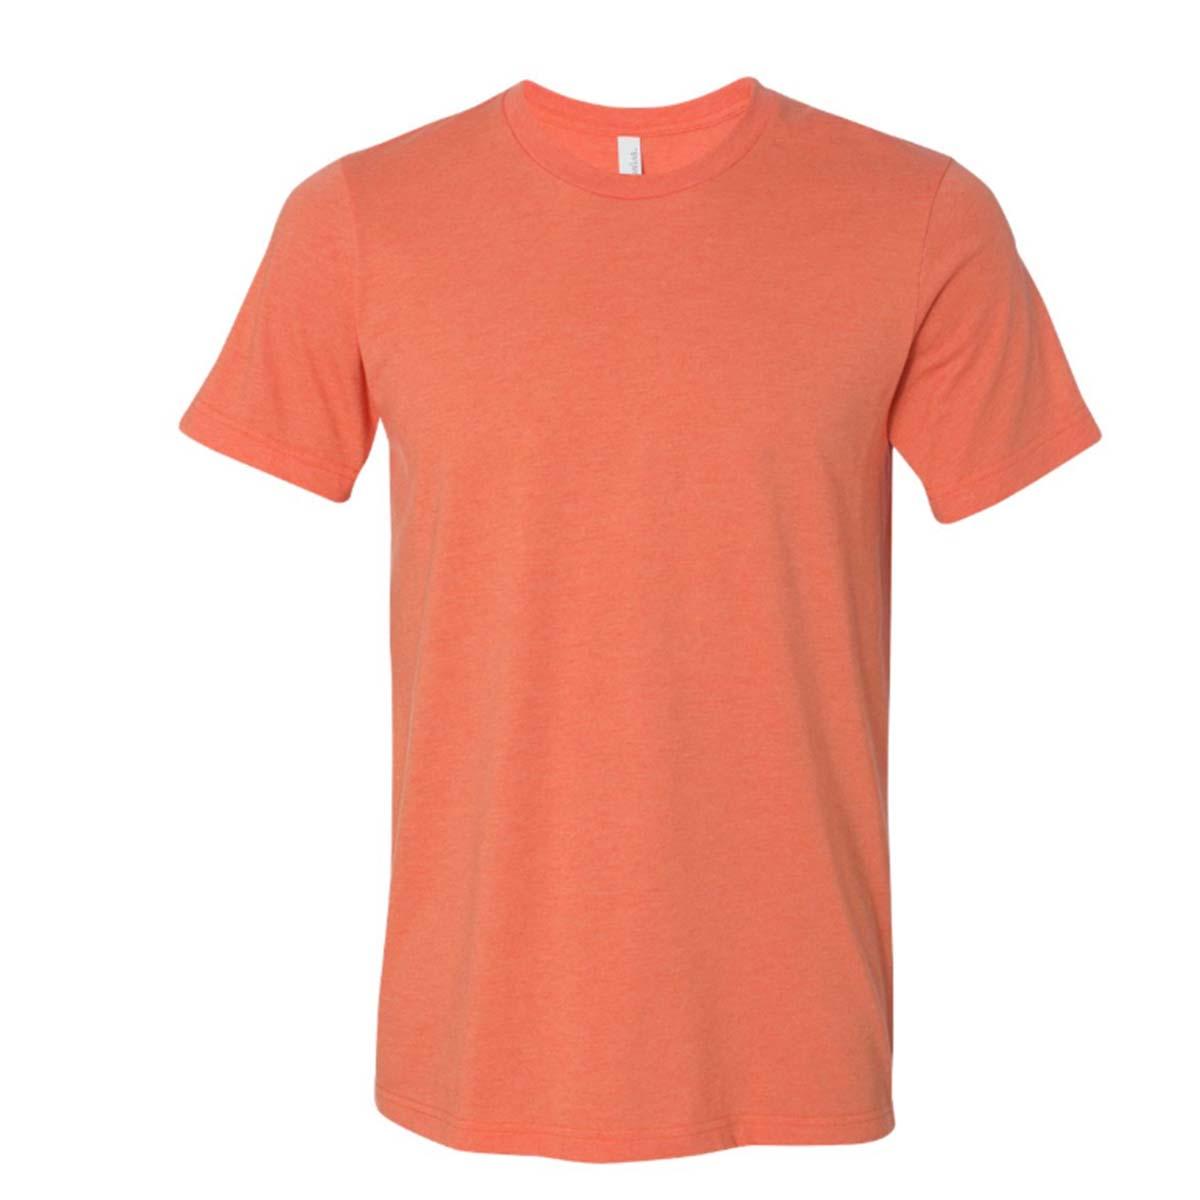 Bellacanvas jerseytshirt heatheredorange